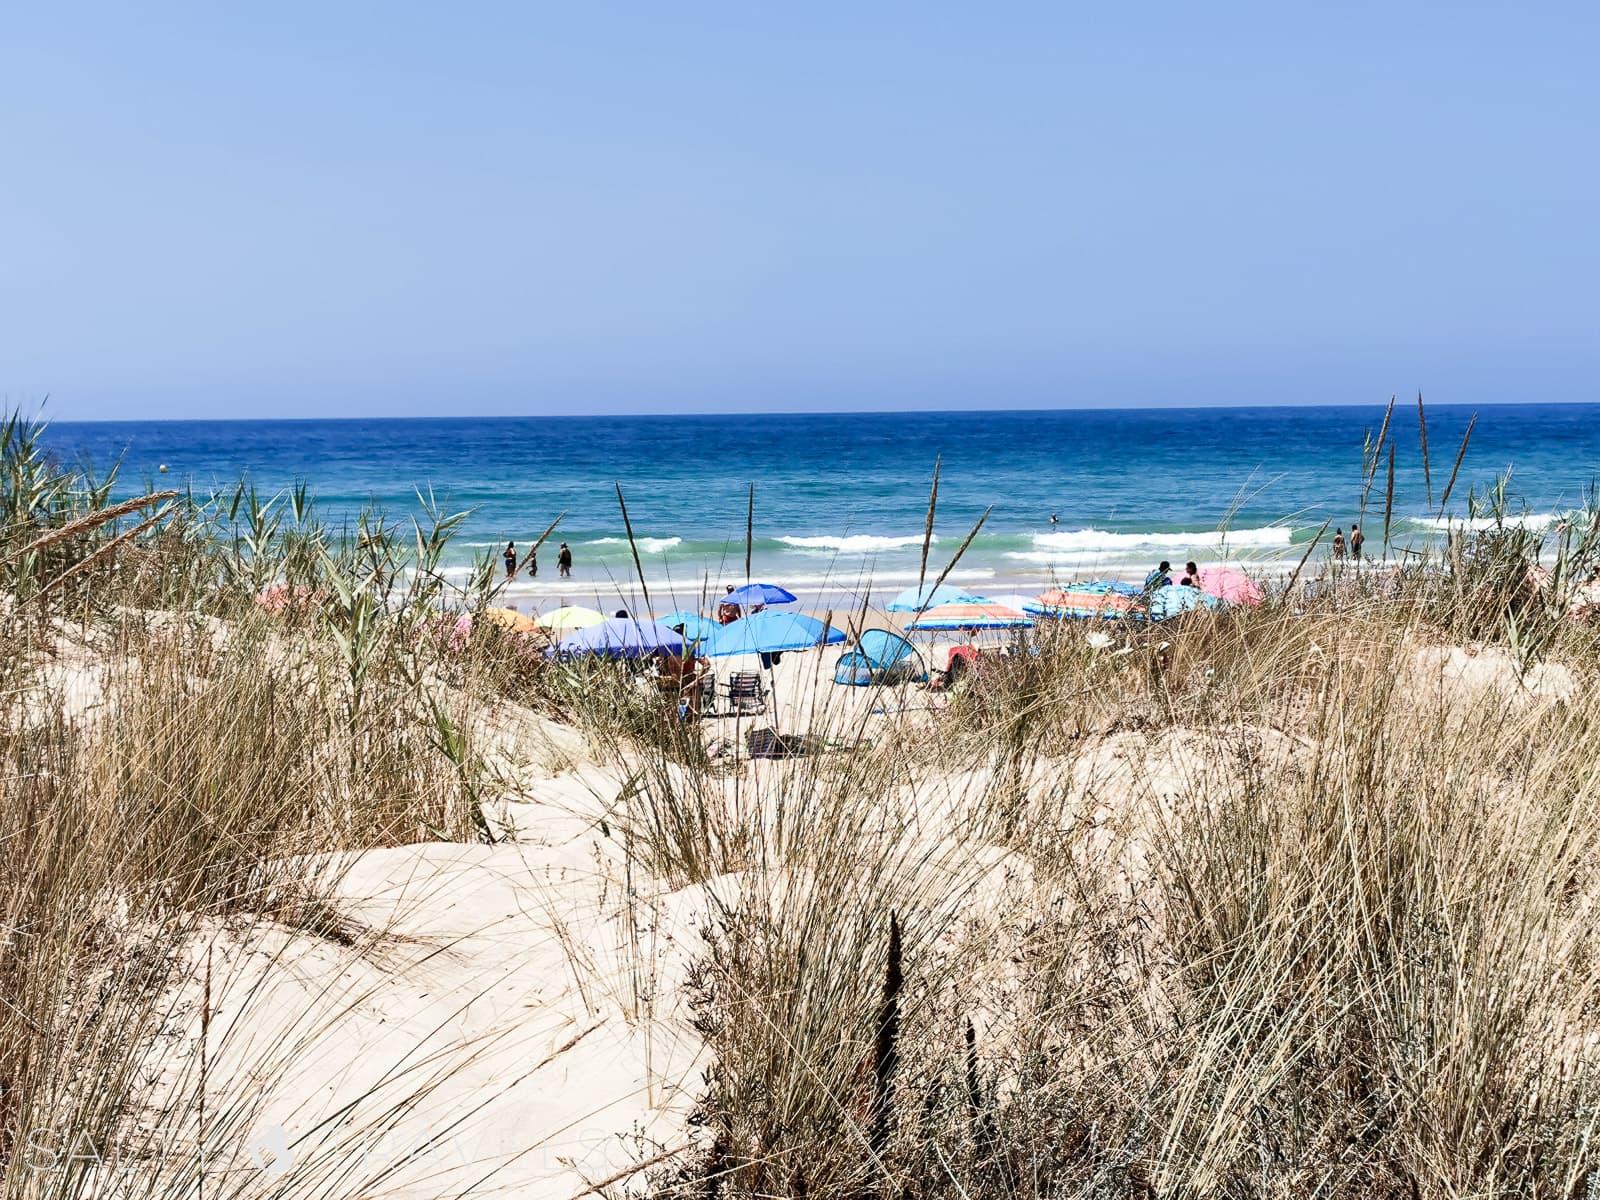 plaża w Andaluzji, Hiszpania